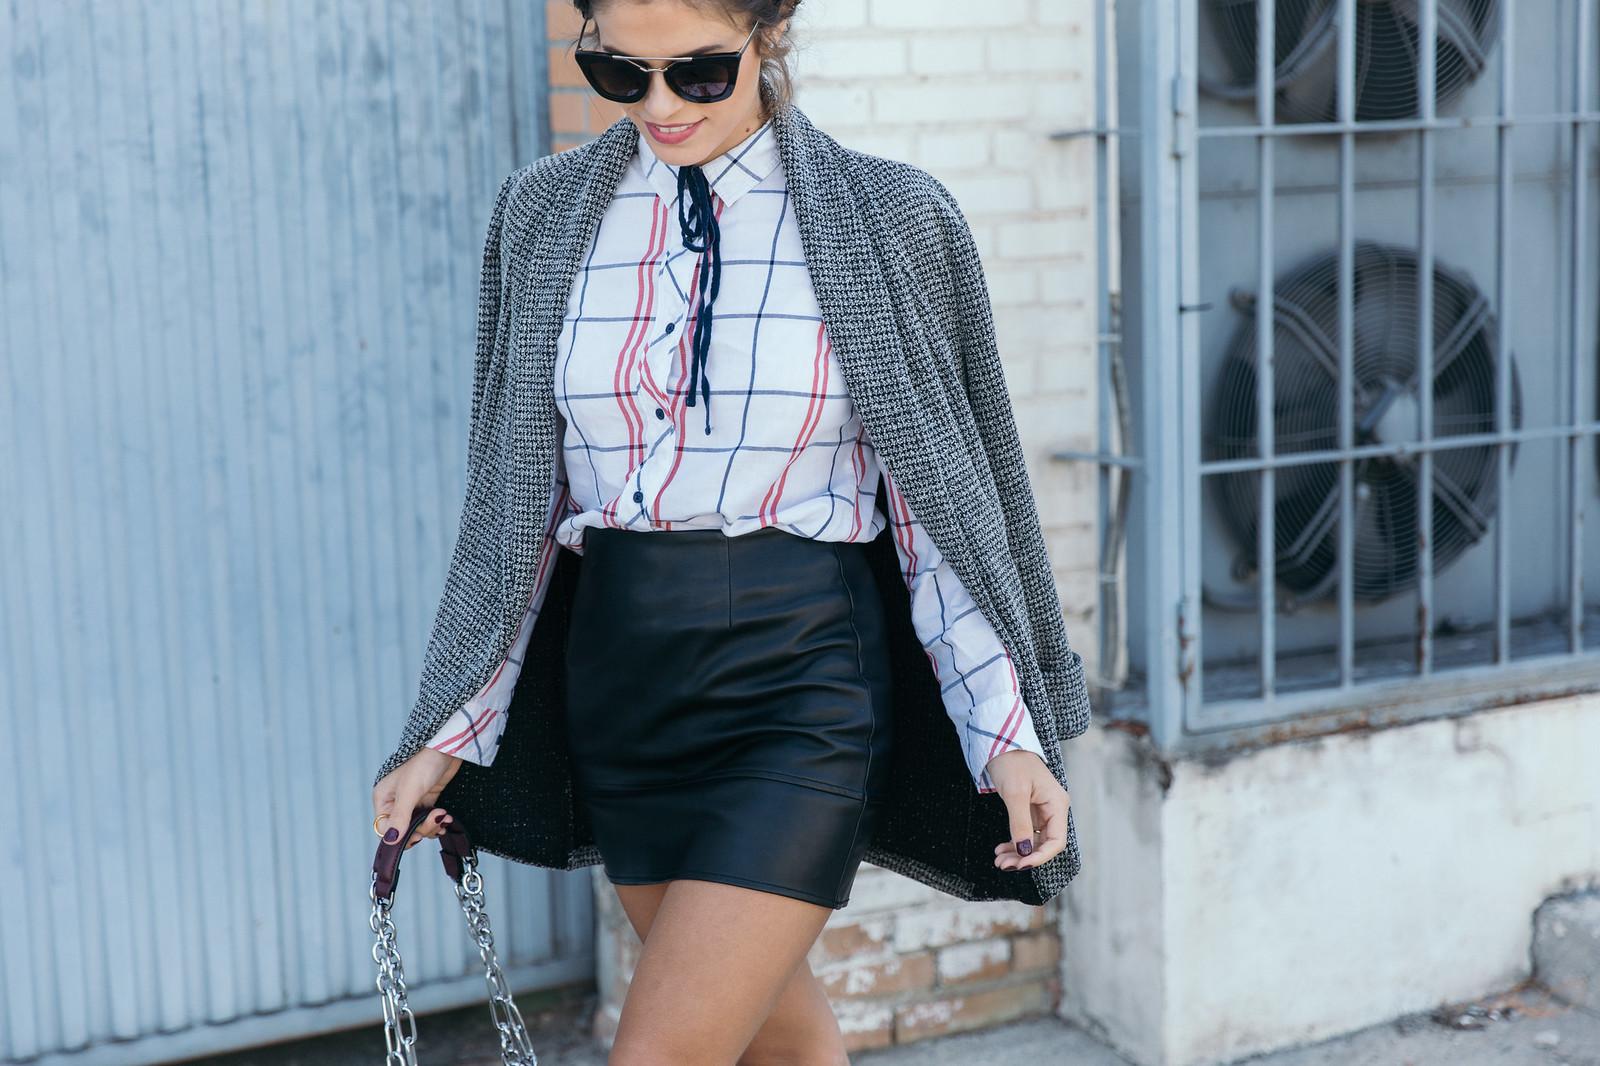 Jessie Chanes Seams for a desire - Black Boots Itshoes Parfois bag faux leather skirt-5